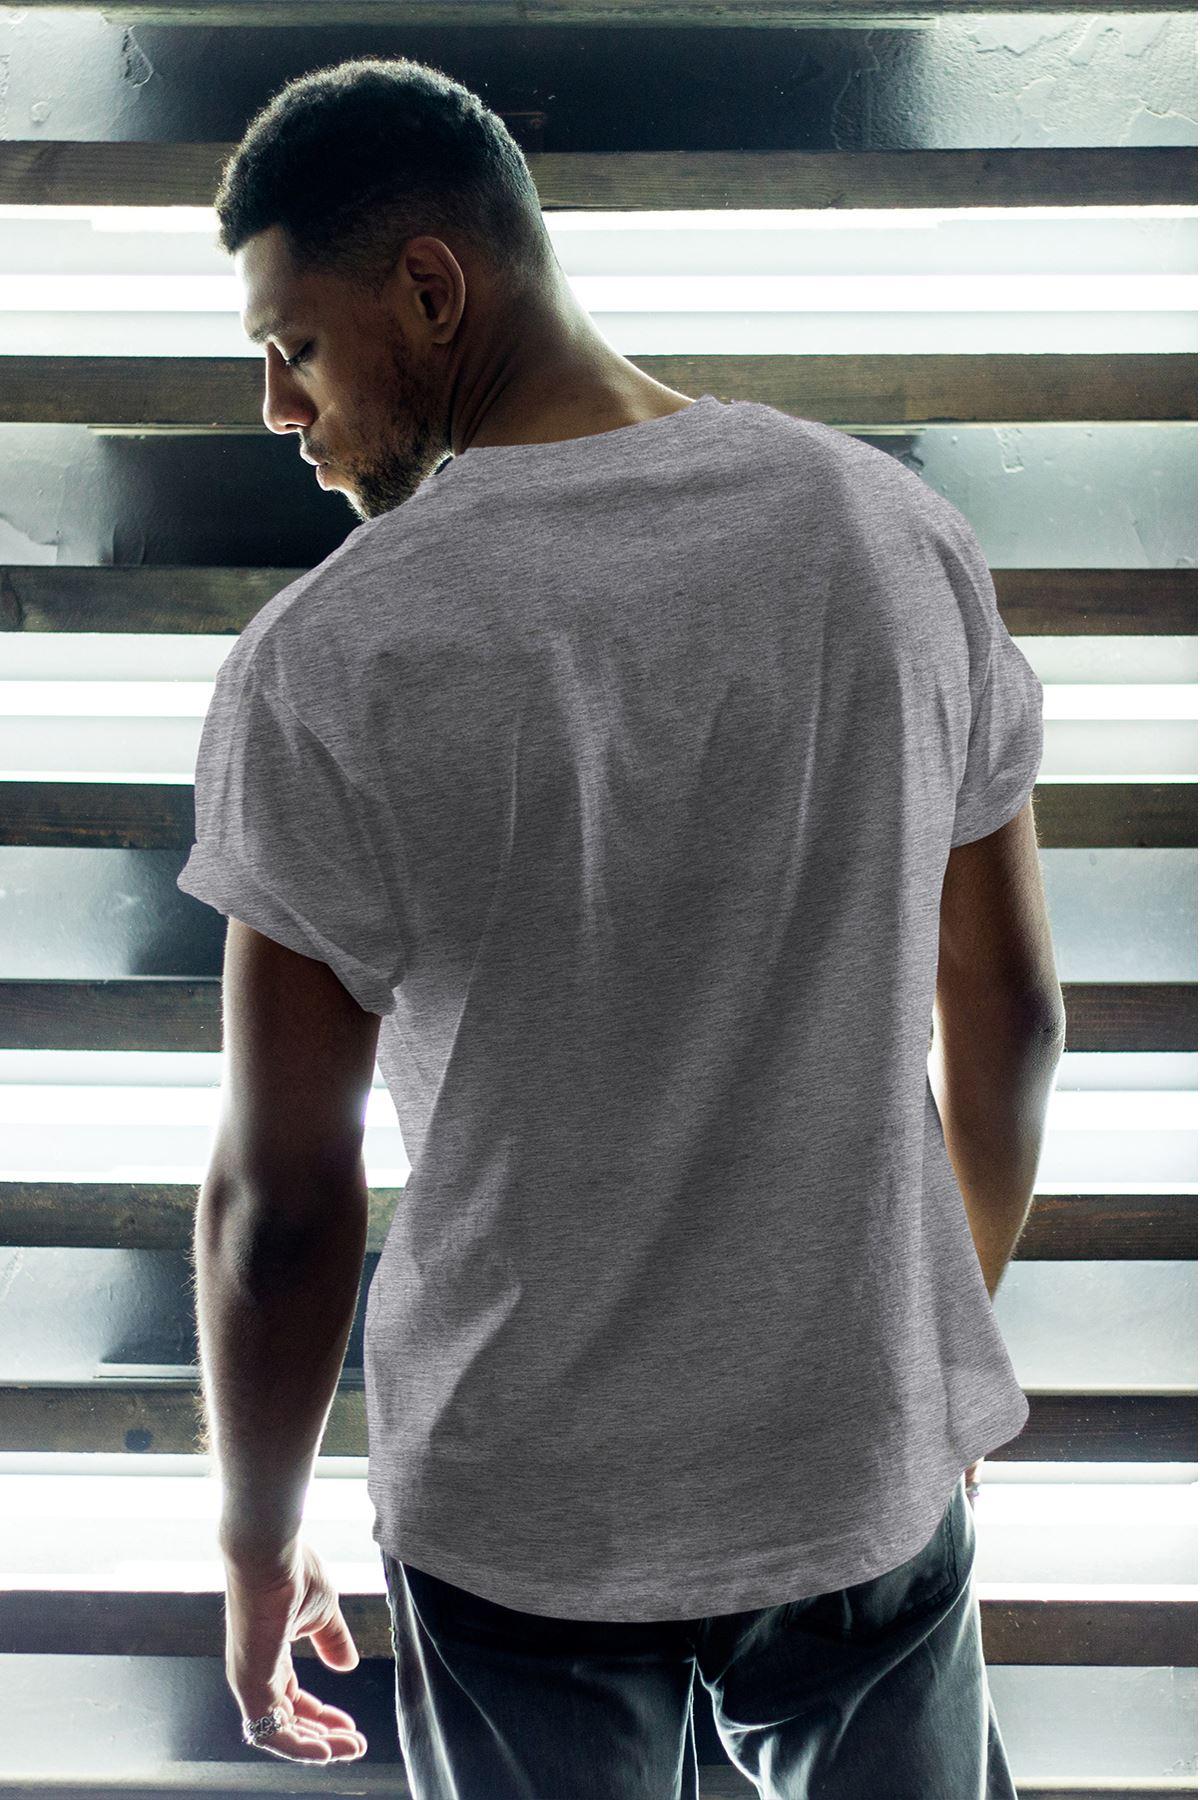 Erk Gri Erkek Oversize Tshirt - Tişört